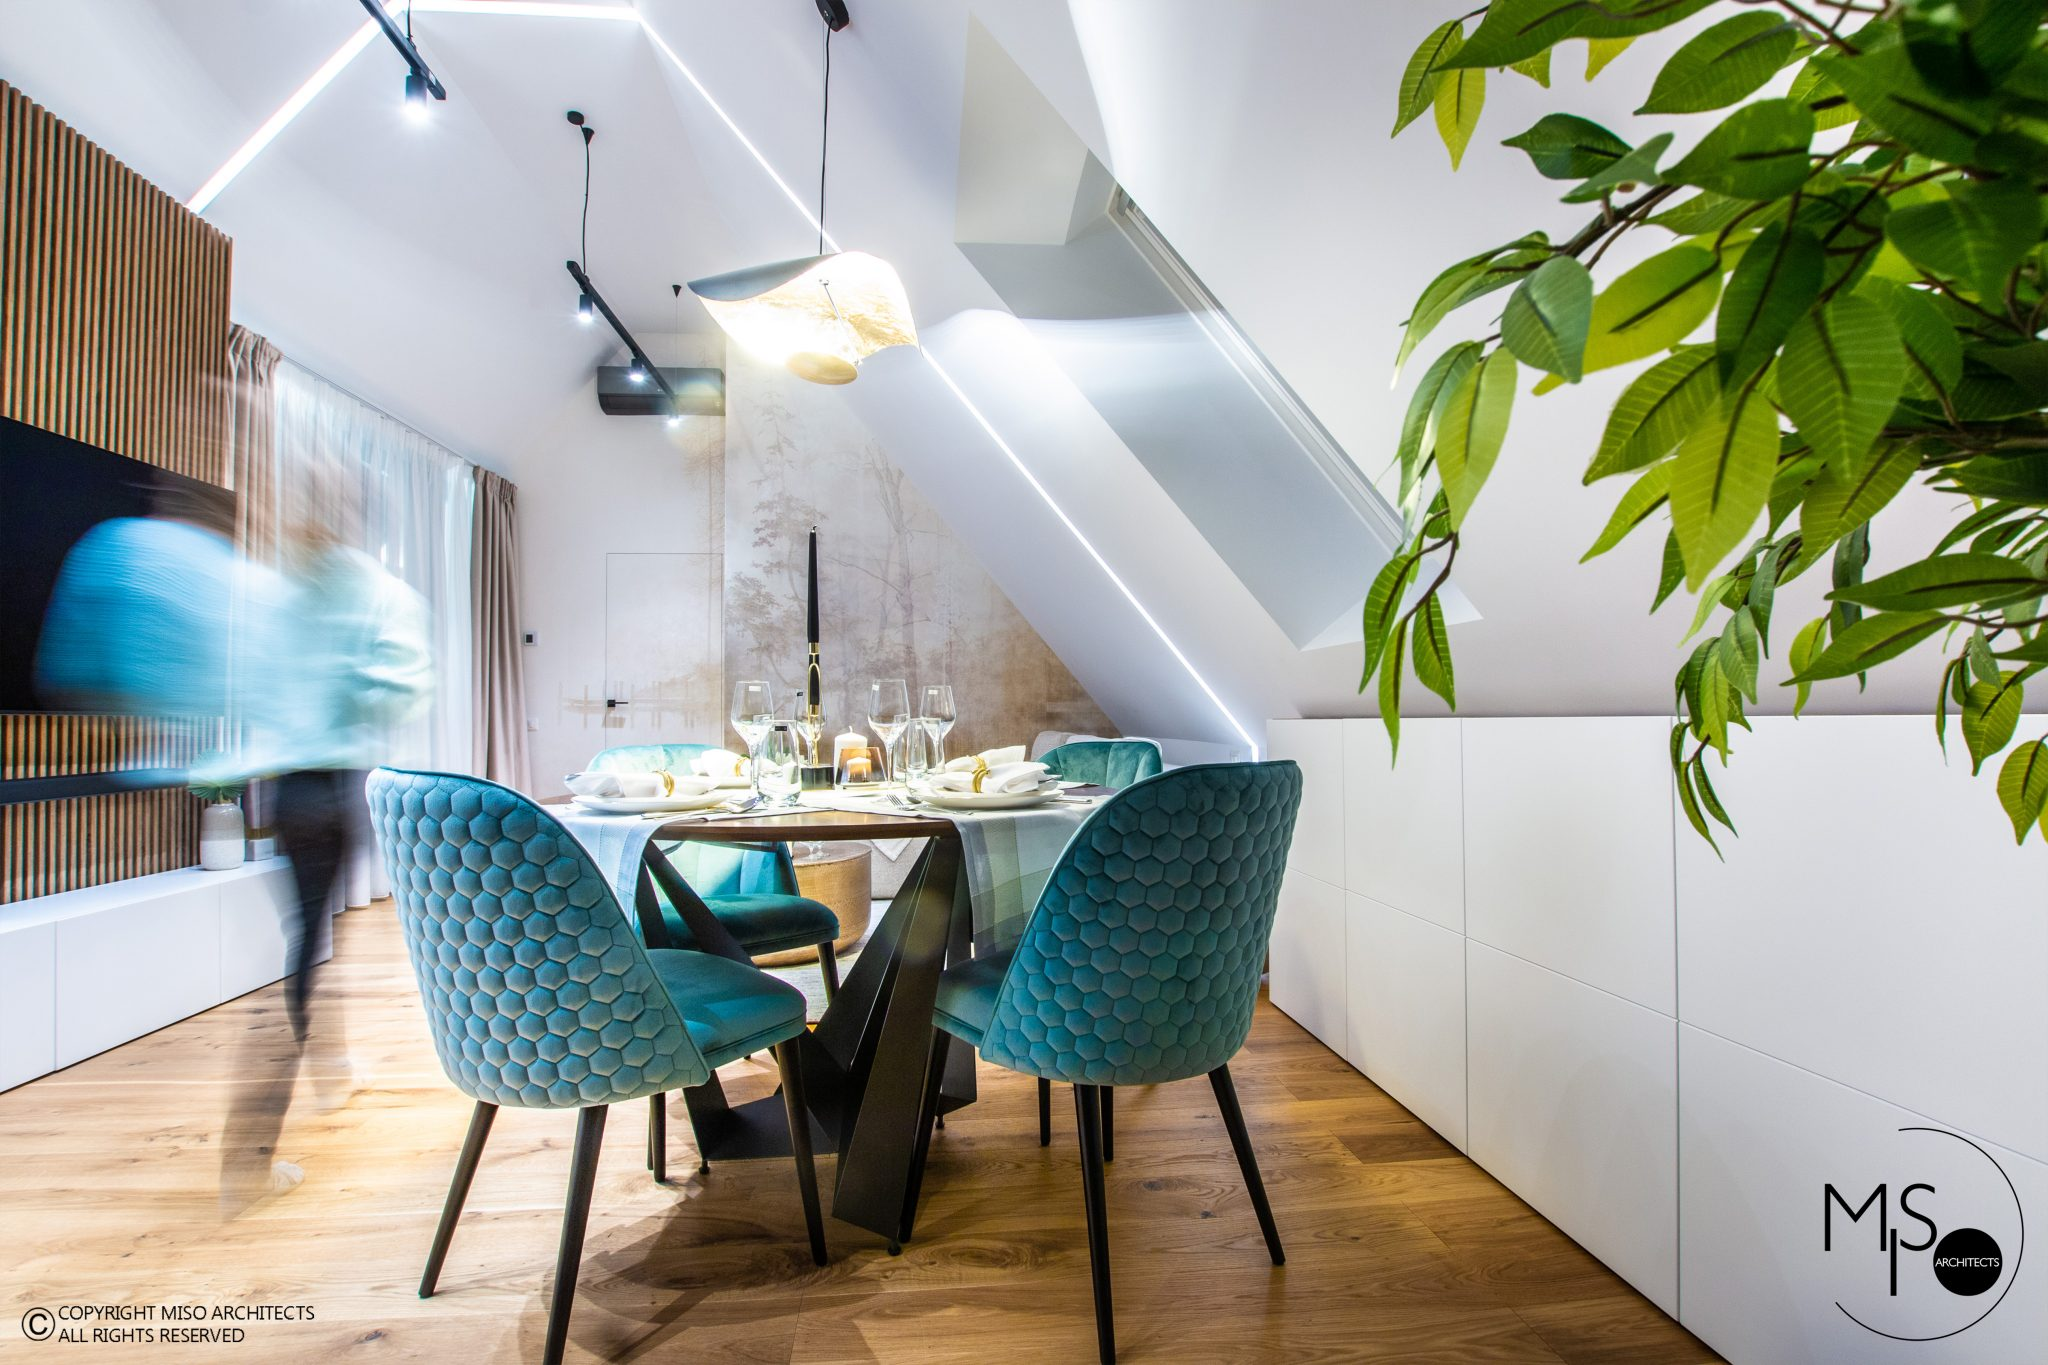 Miso-Architects-in-Brasov-scaled.jpg